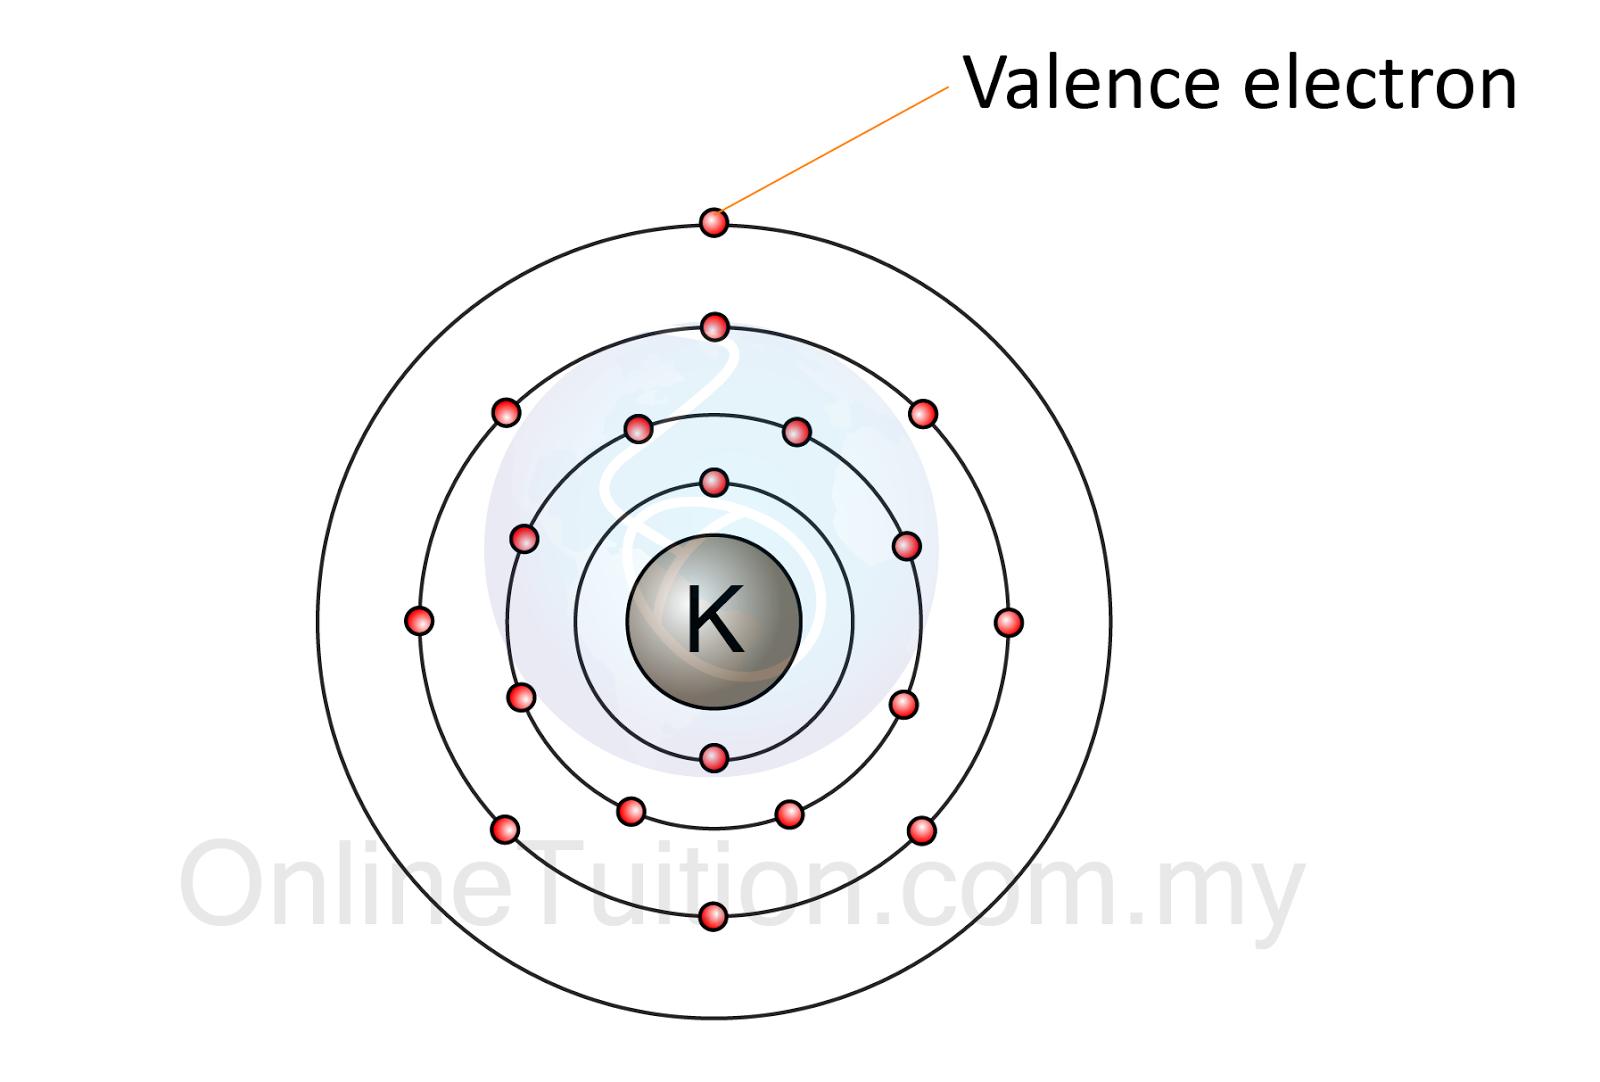 Electron Arrangement In Atom Spm Chemistry